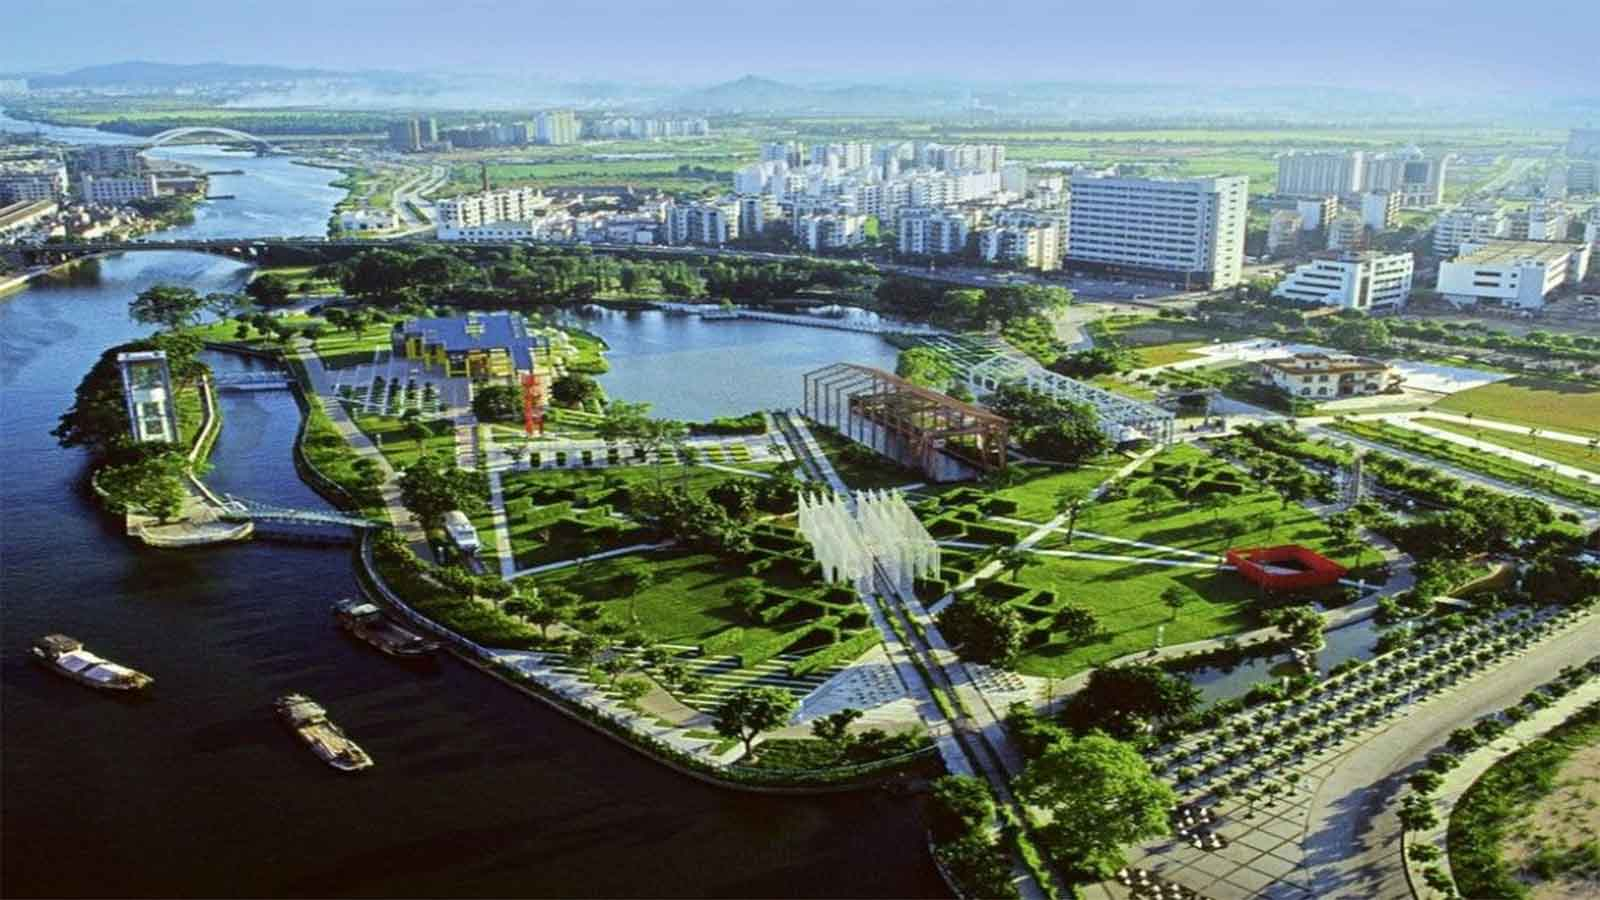 Zhongshan Shipyard Park